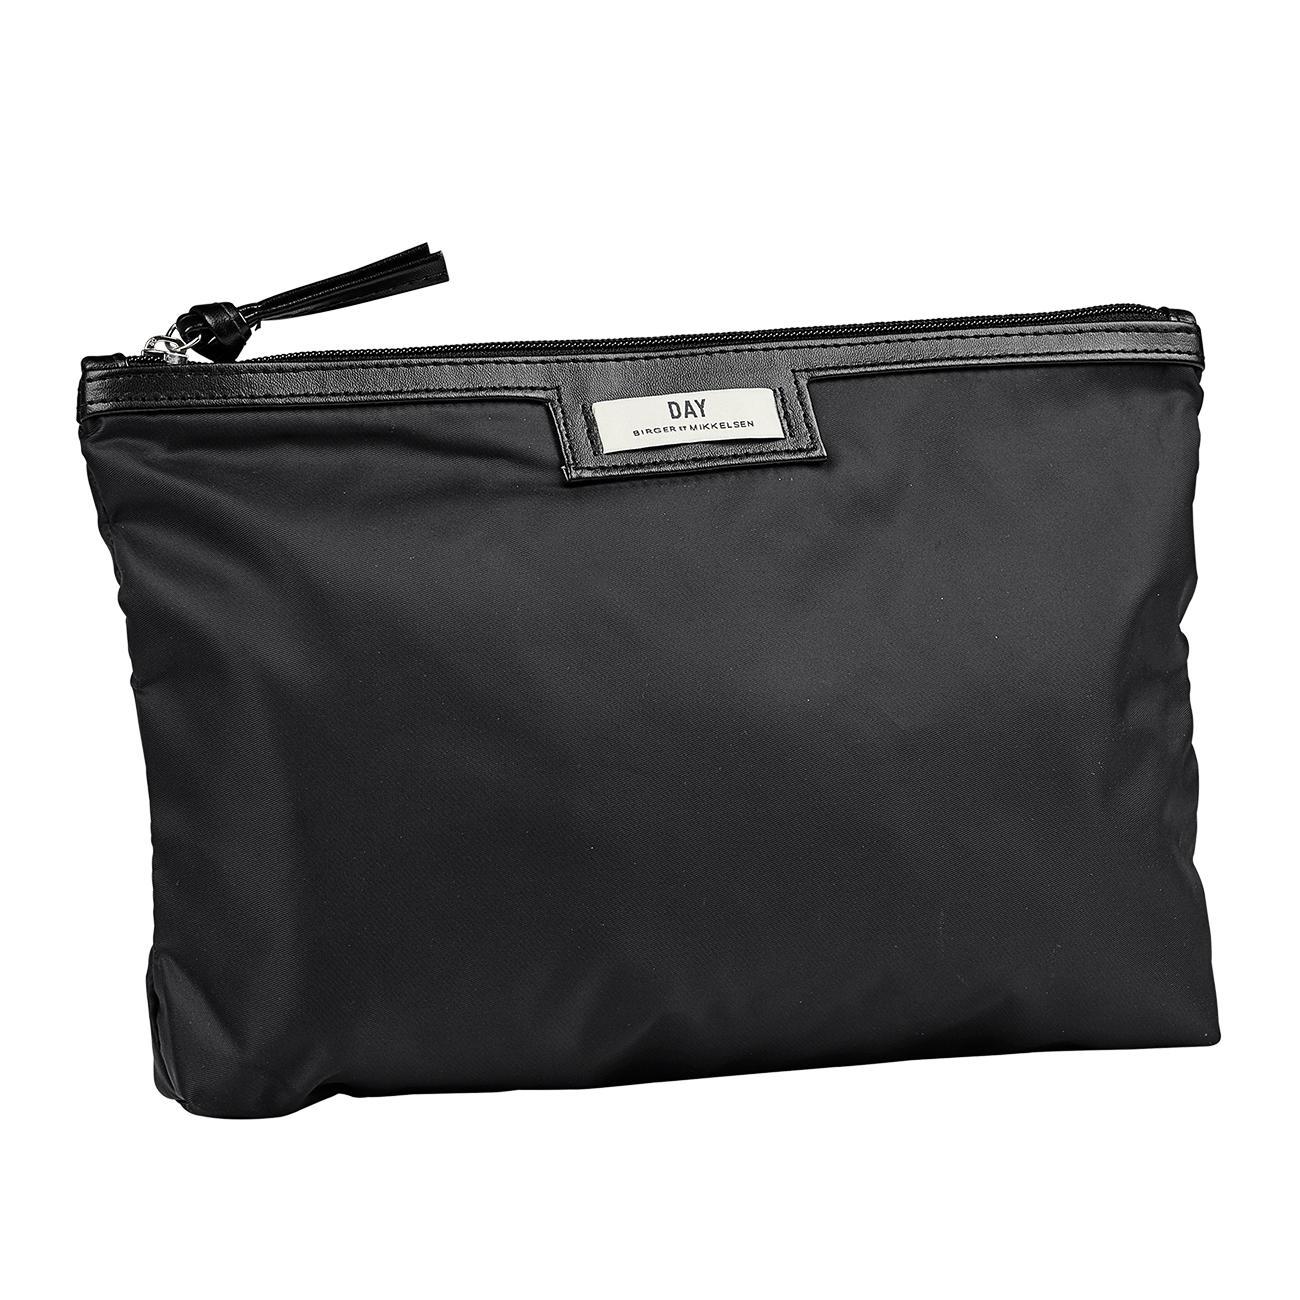 c73b356bf51 Day nylon-beauty bag of -shopper